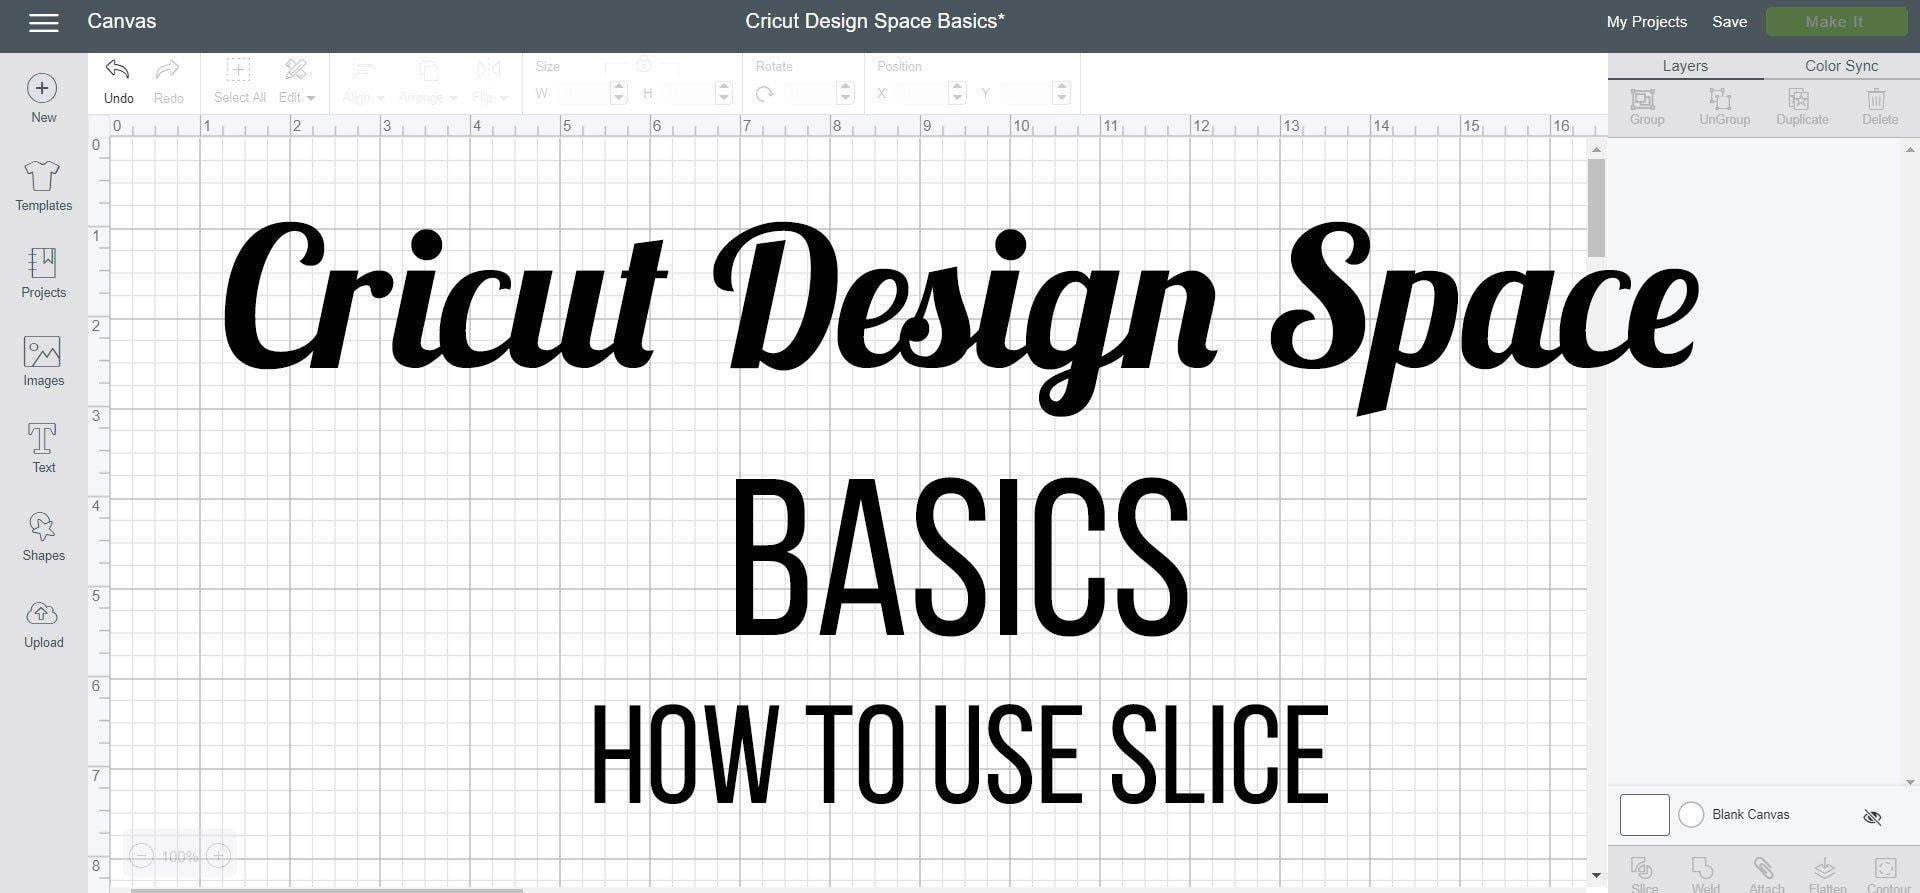 Cricut Design Space Basics how to use slice